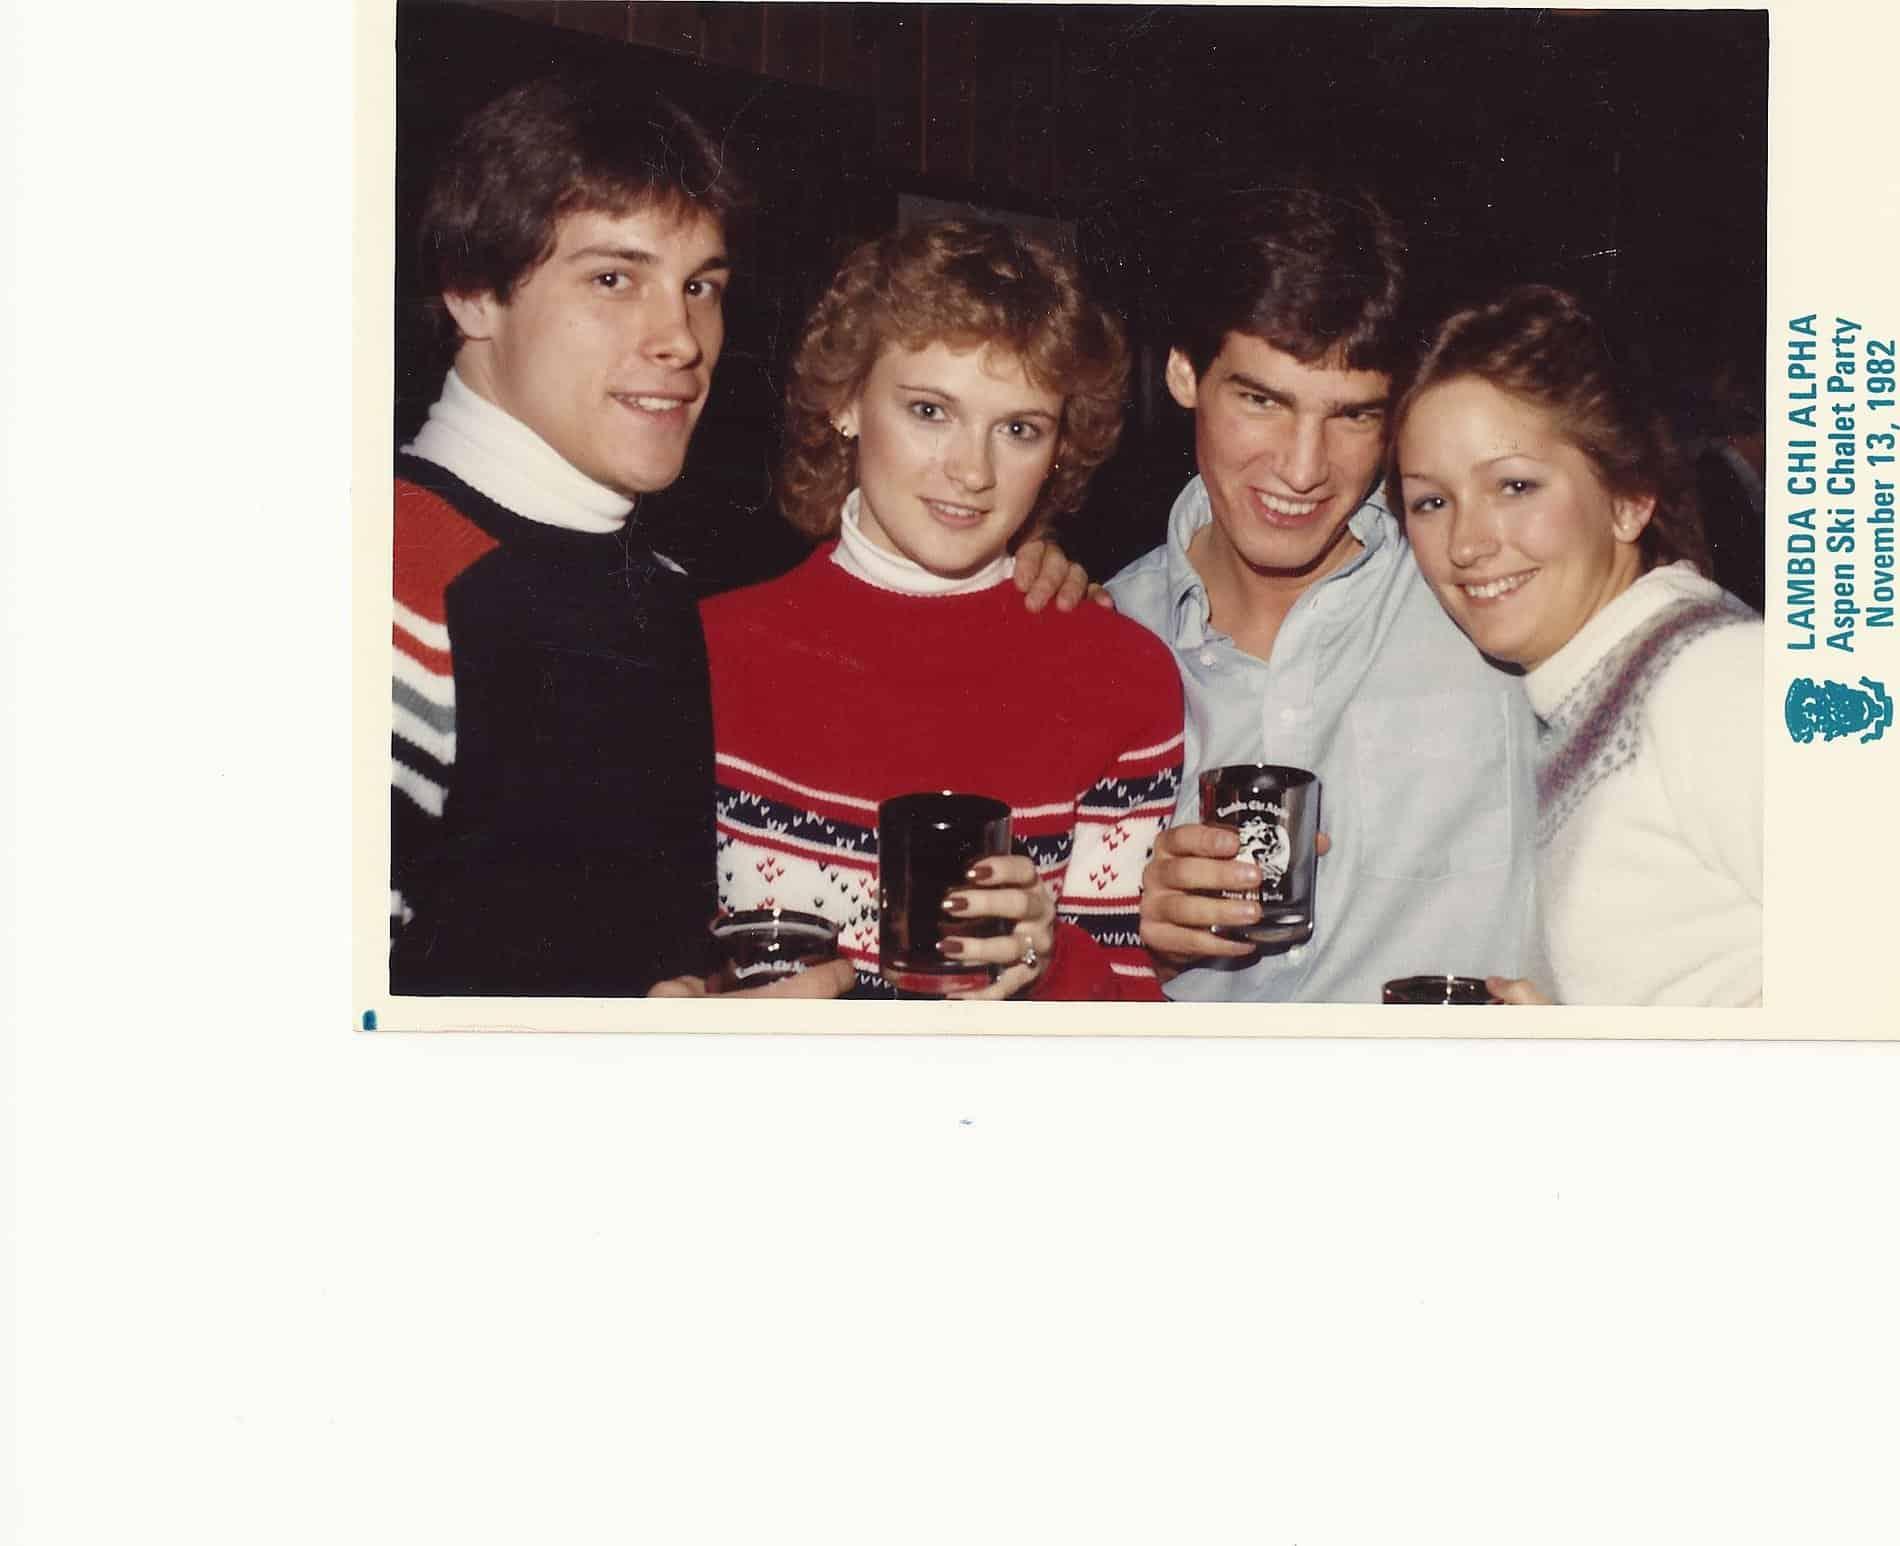 1982 Aspen Ski Party (Willar)